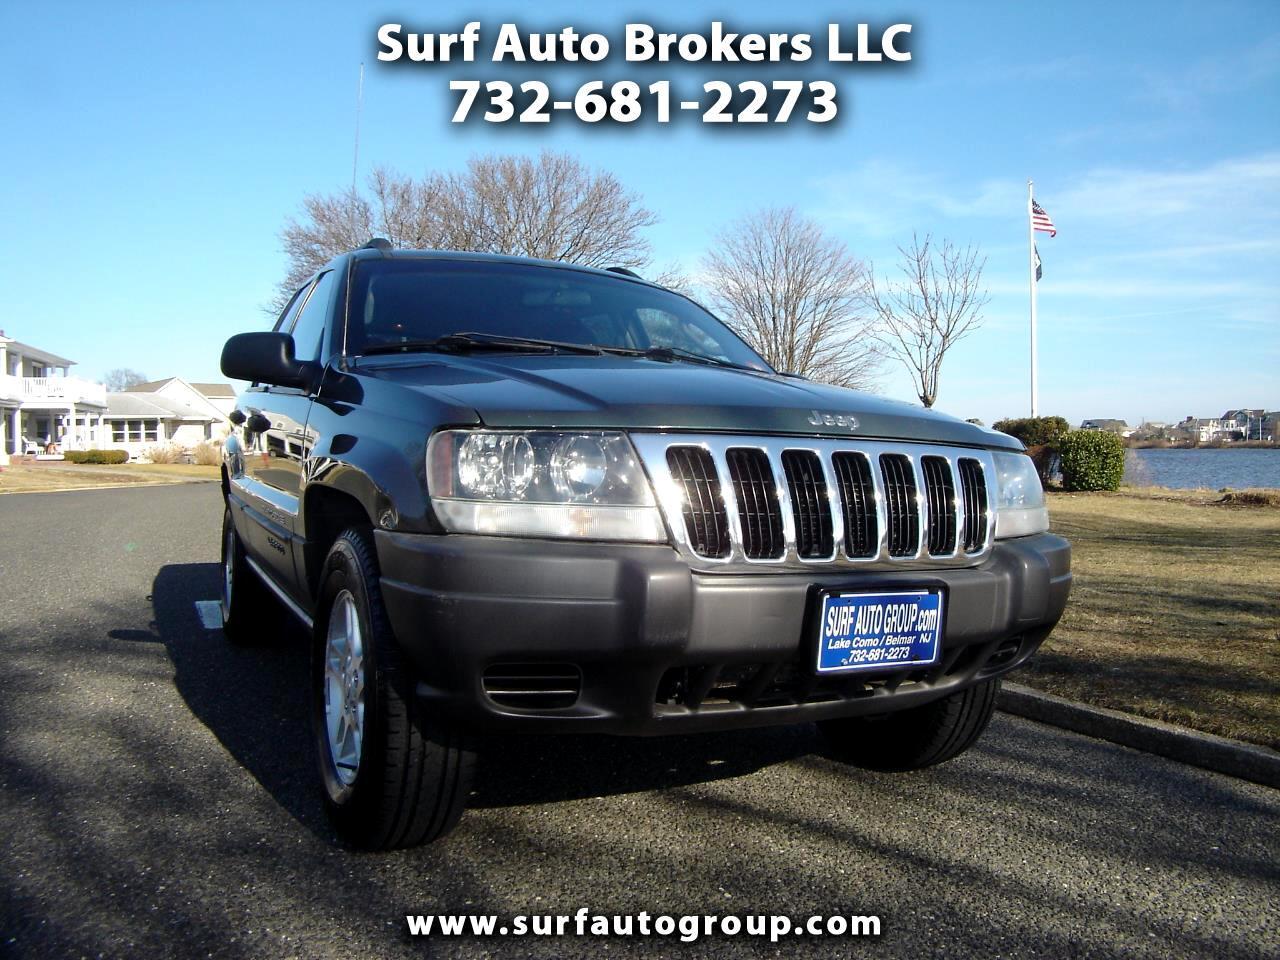 2002 Jeep Grand Cherokee Laredo 4WD